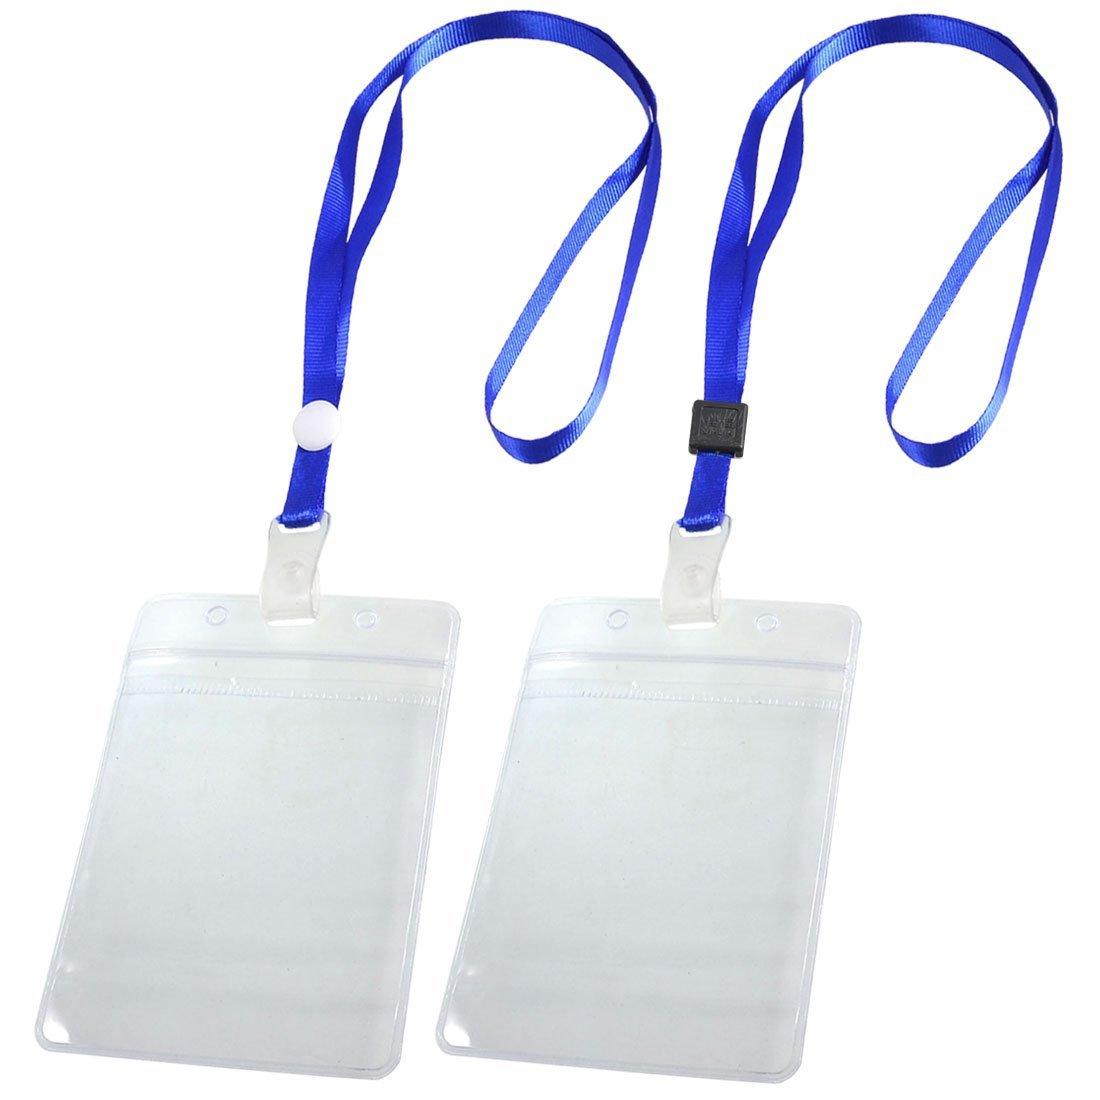 SOSW-2 Pcs ID Card Badge Holder Adjustable Neck Strap Lanyard Blue Clear